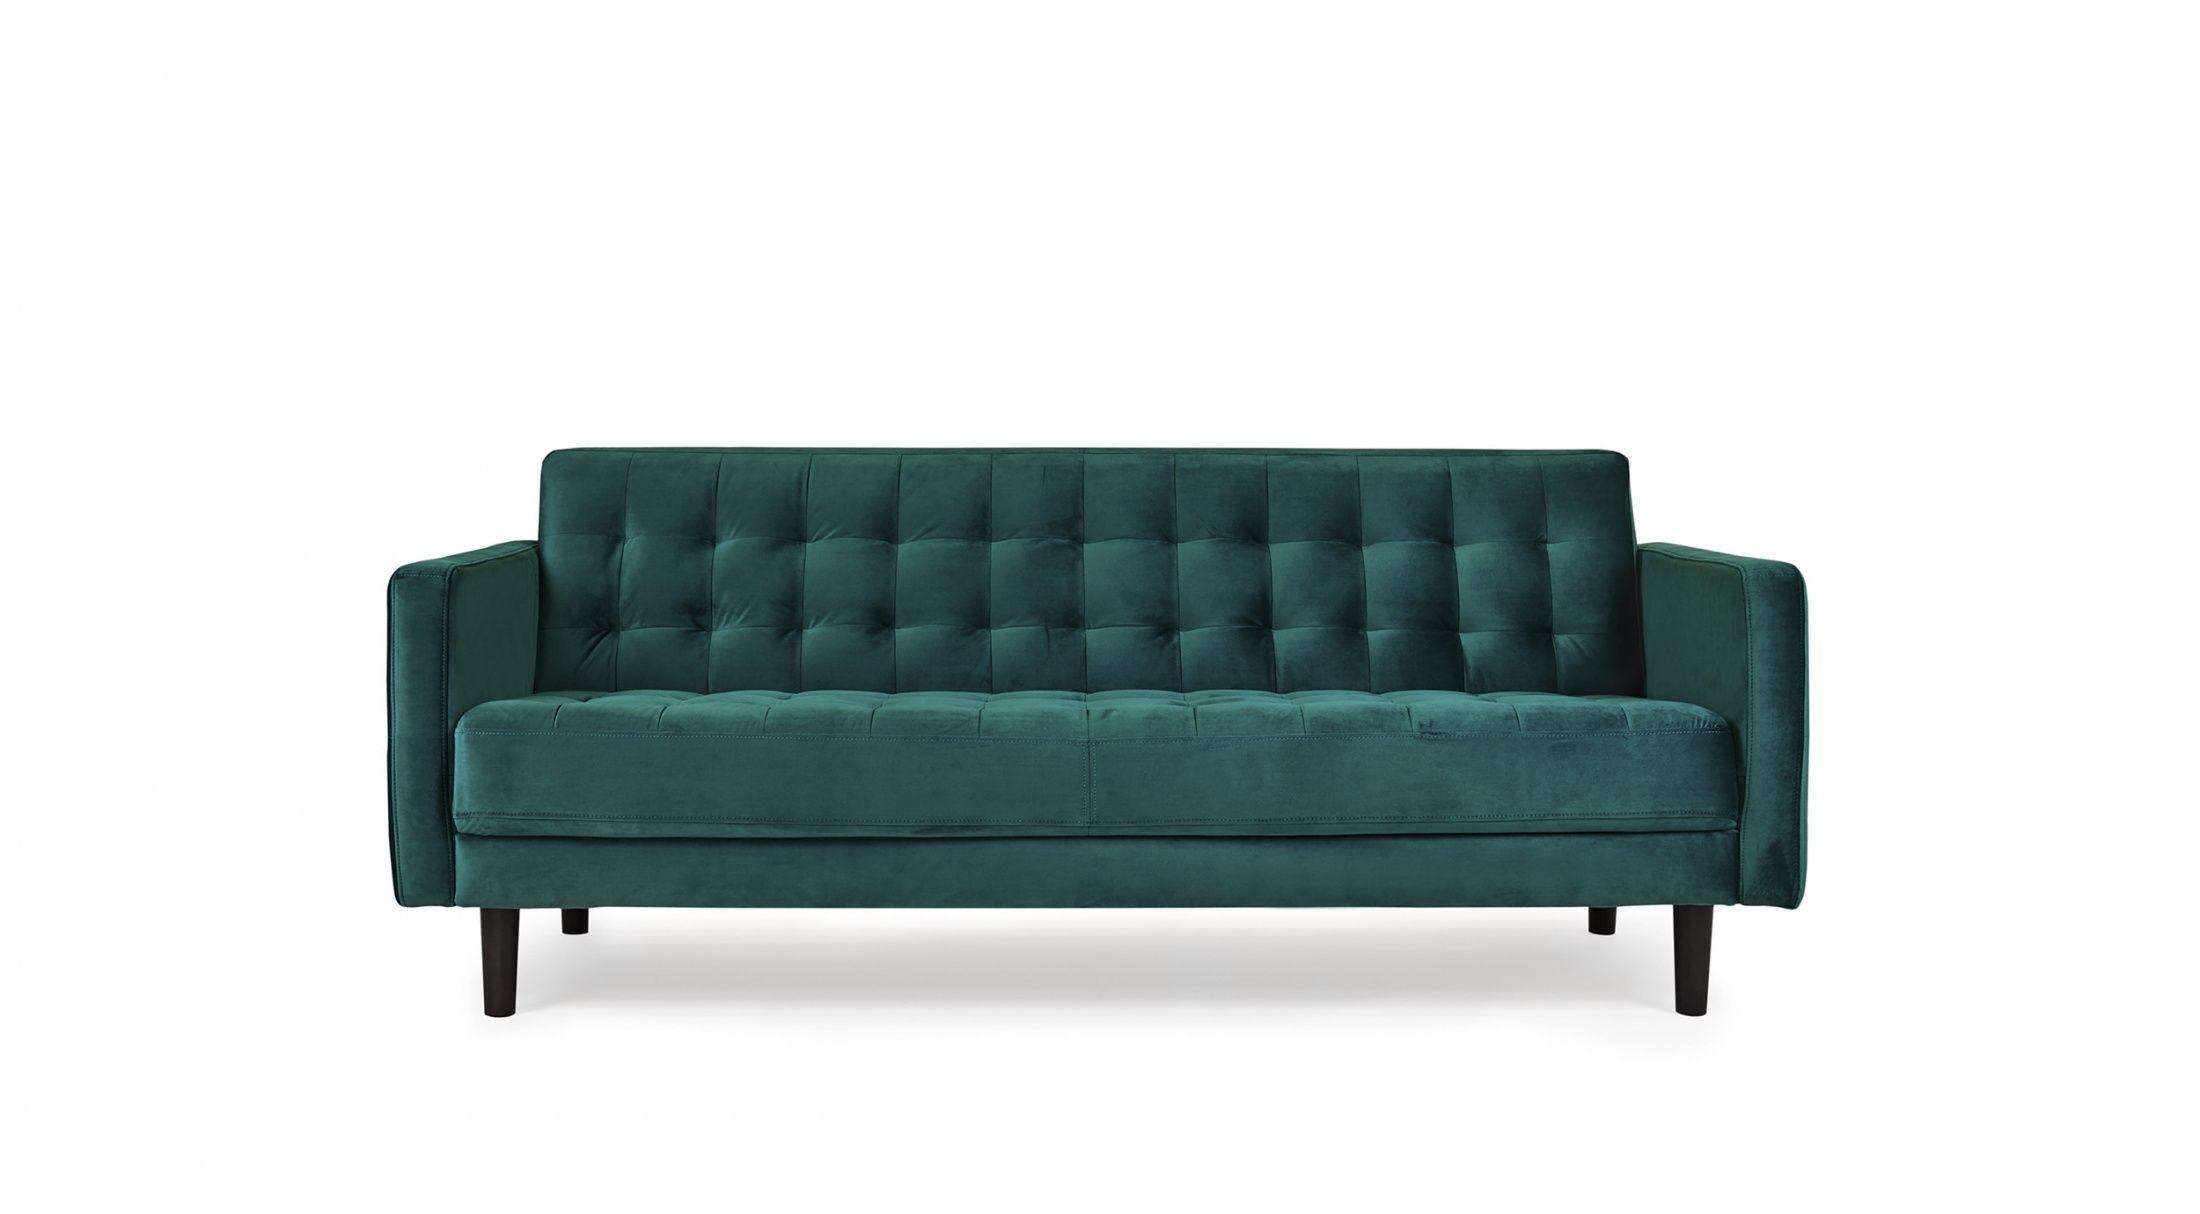 Harriett sofa 3 seater classical mid century royal green teal